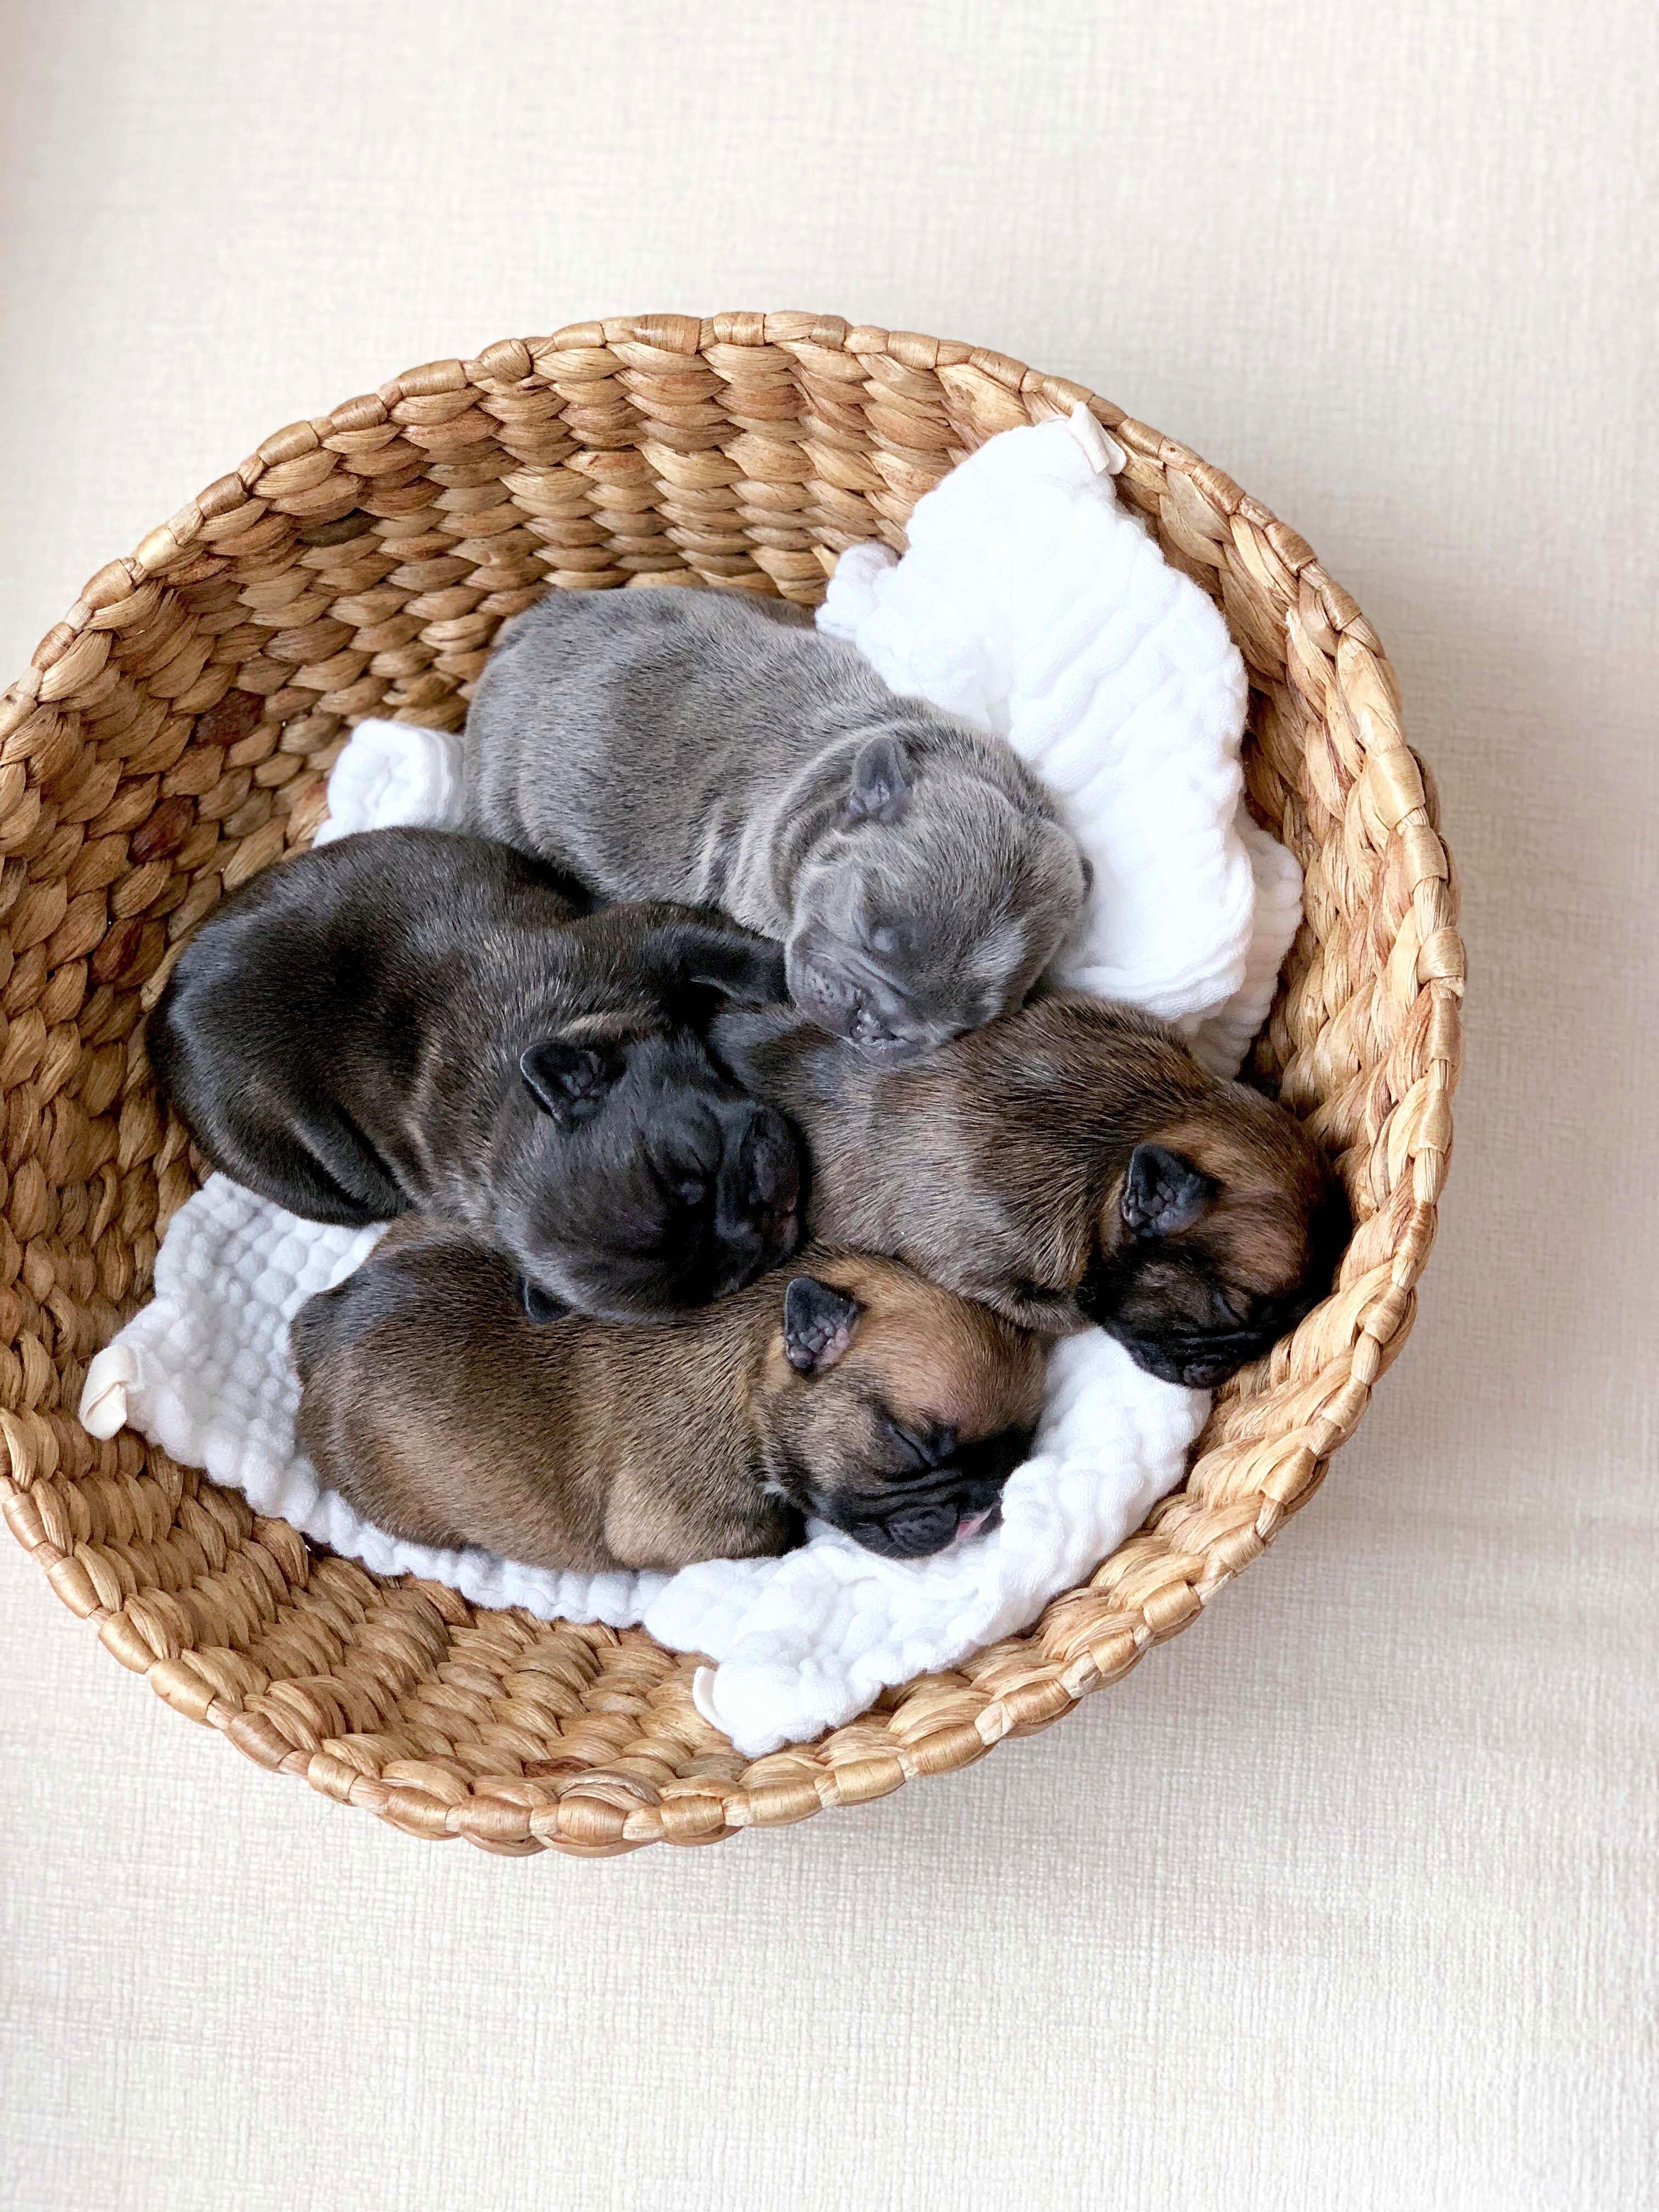 Basket O Frenchies French Bulldog Puppies French Bulldog Dog